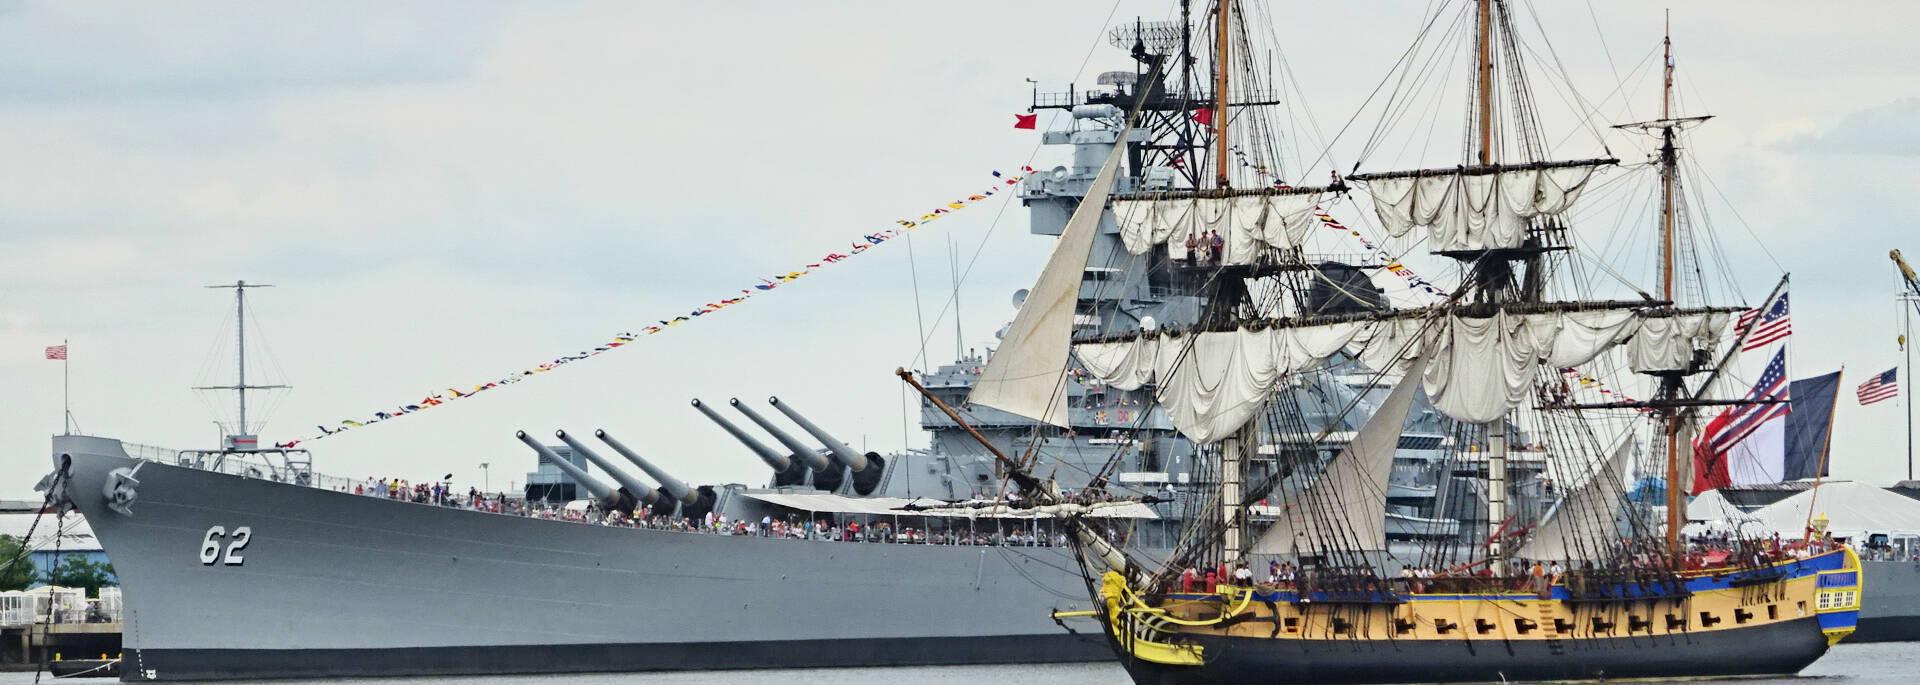 The frigate arriving in Philadelphia, United-Sates - © Office de tourisme Rochefort Océan